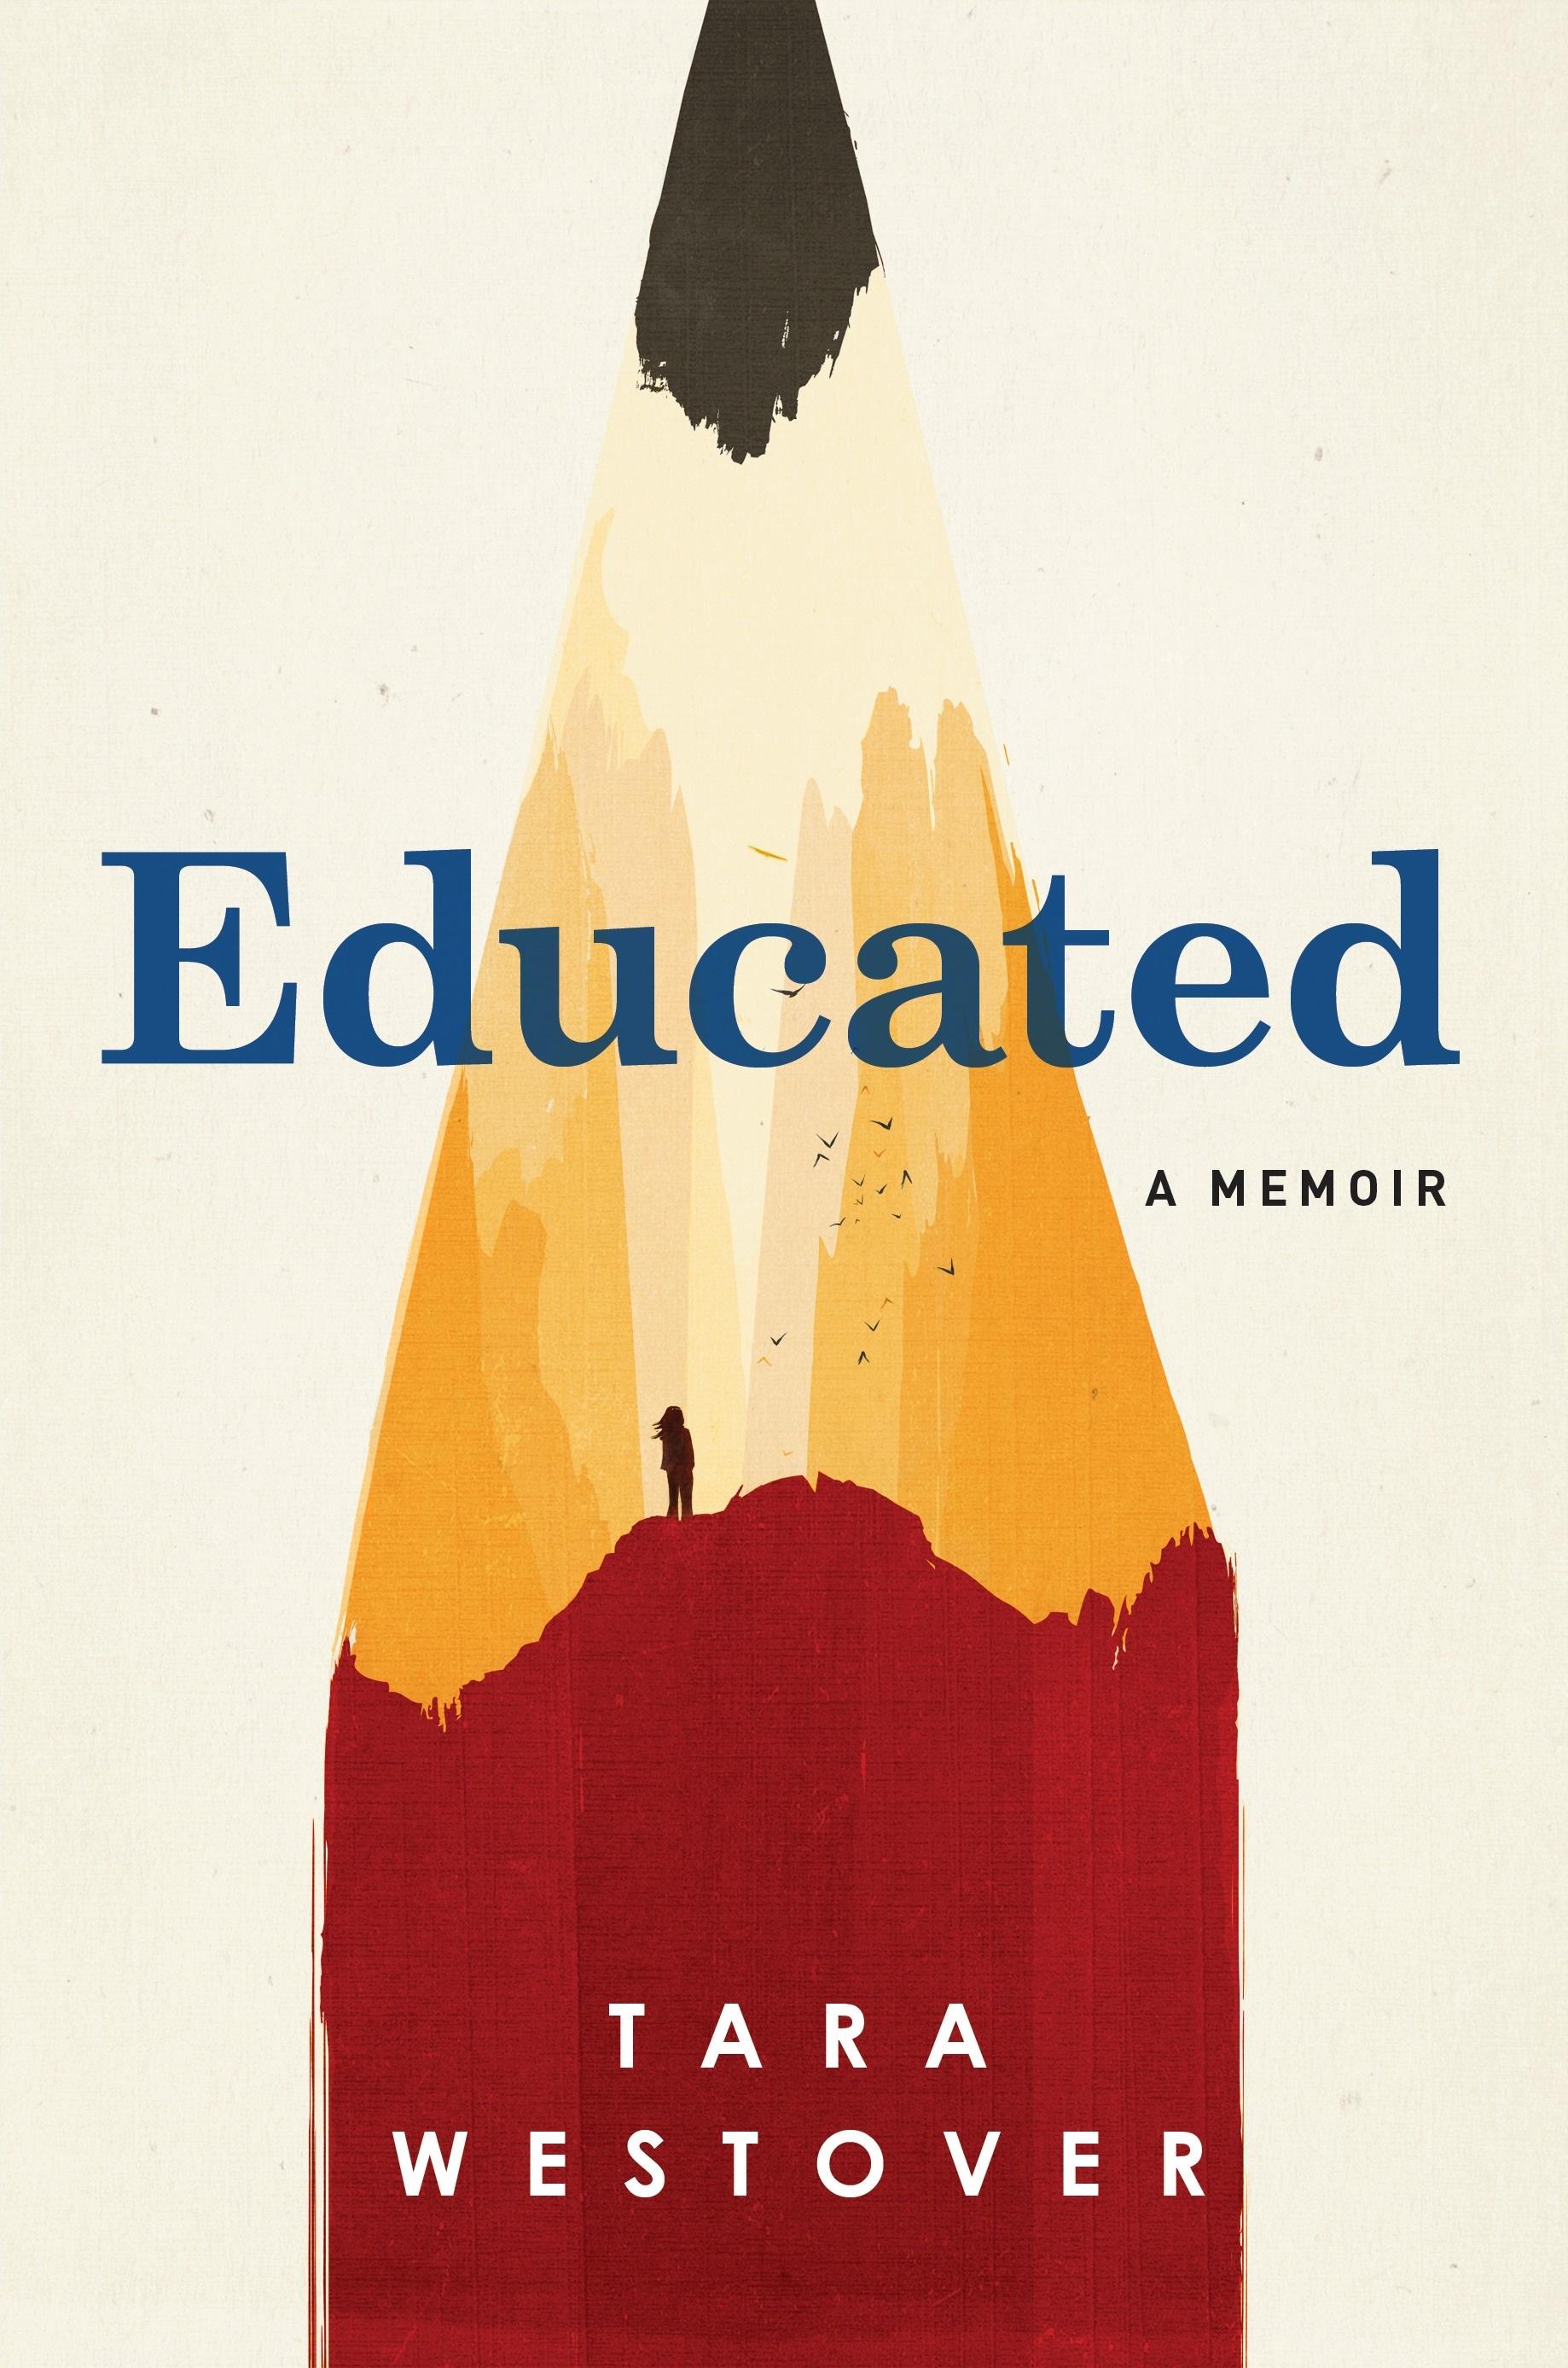 tara-westover-educated-book-memoir-fundamentalist-mormon-survivalist